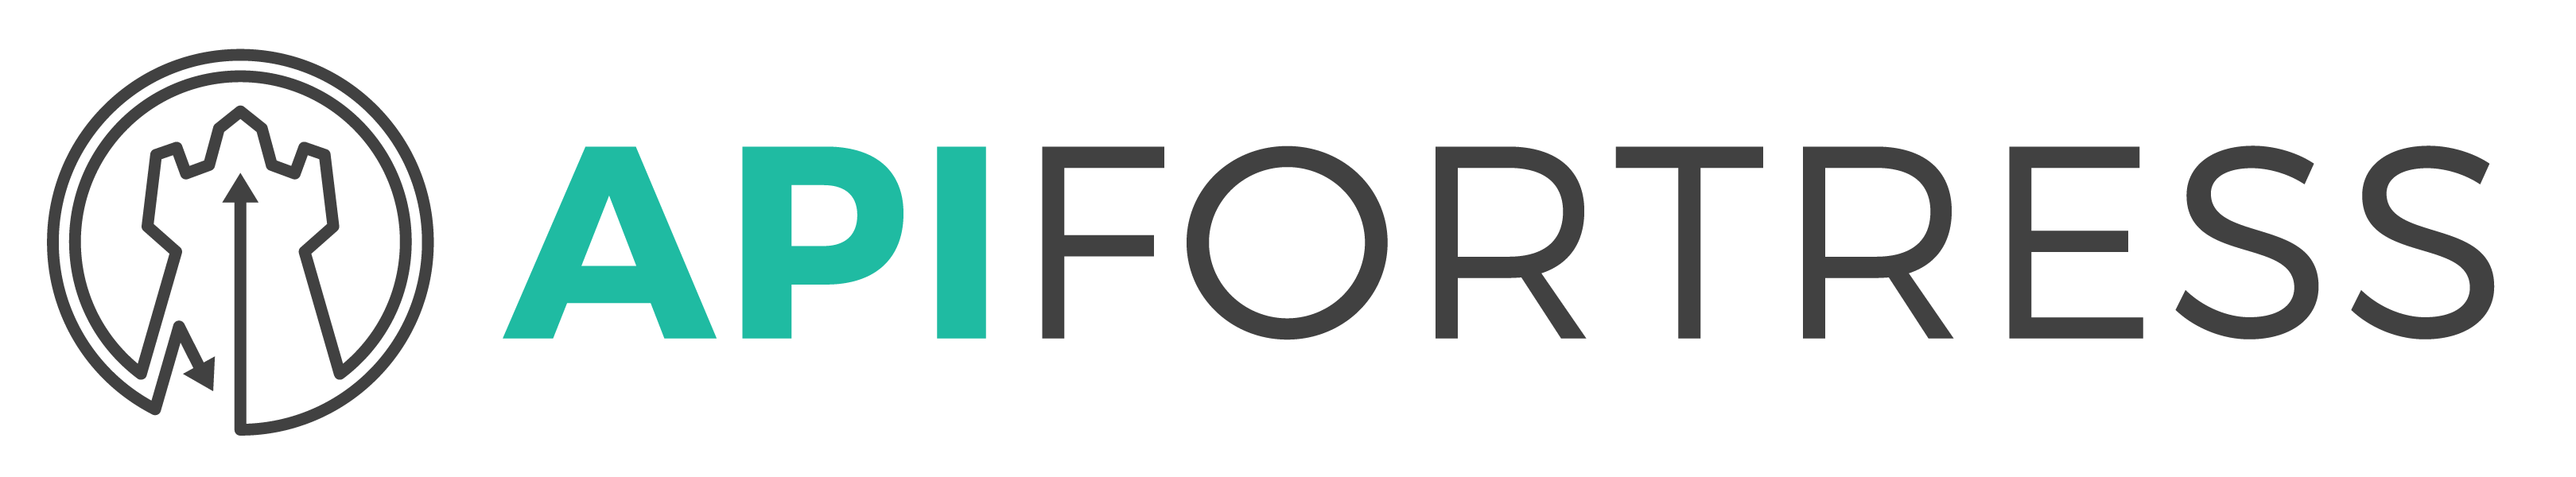 API-Fortress_Logo-2016_Rf-2